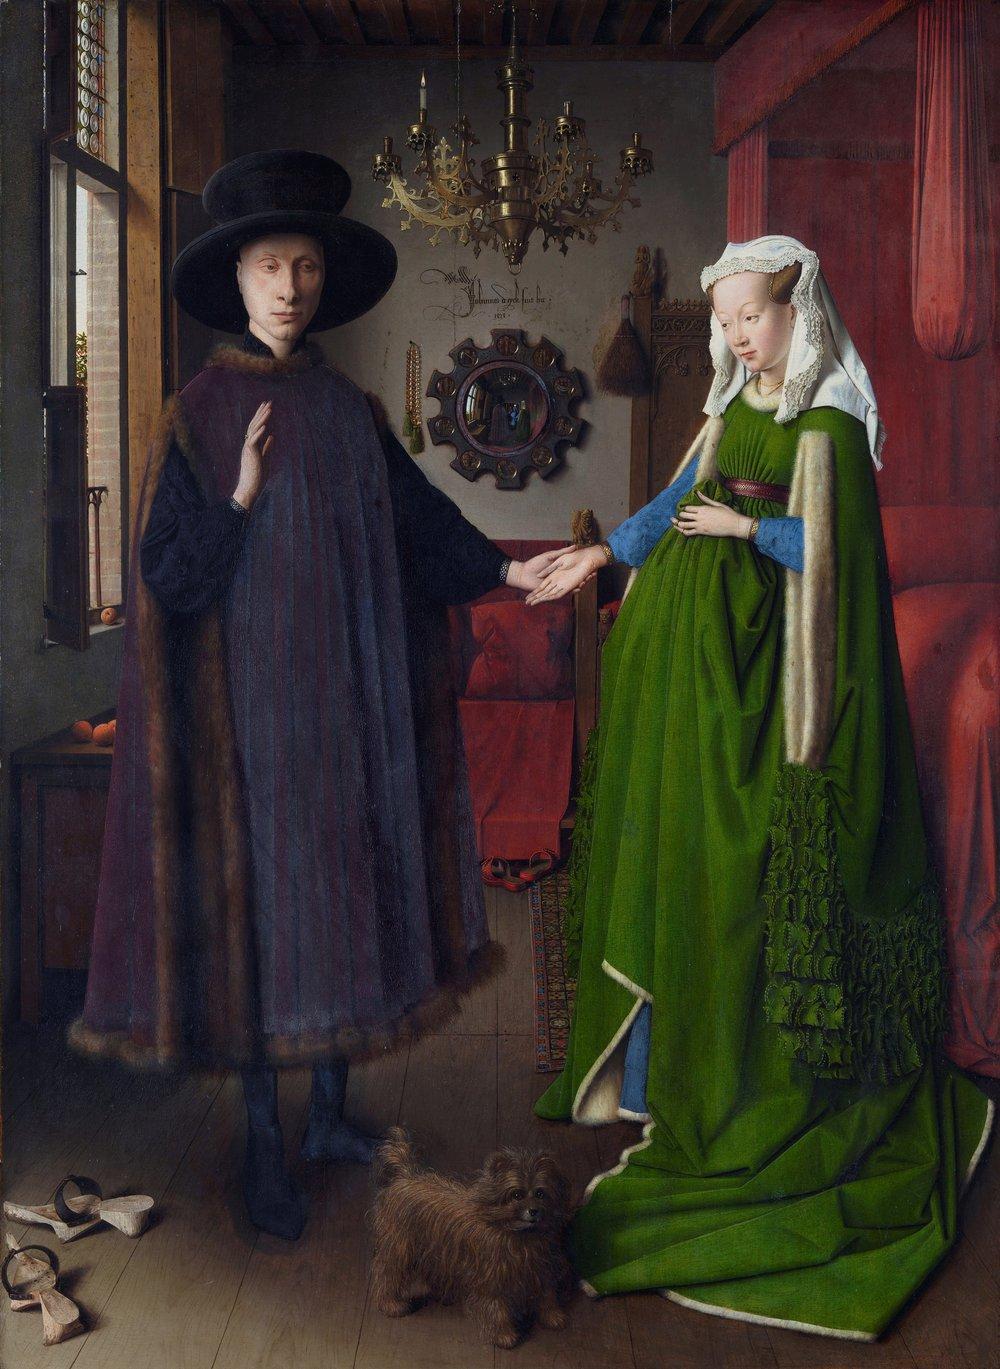 Arnolfini Portrait by Van Eyck